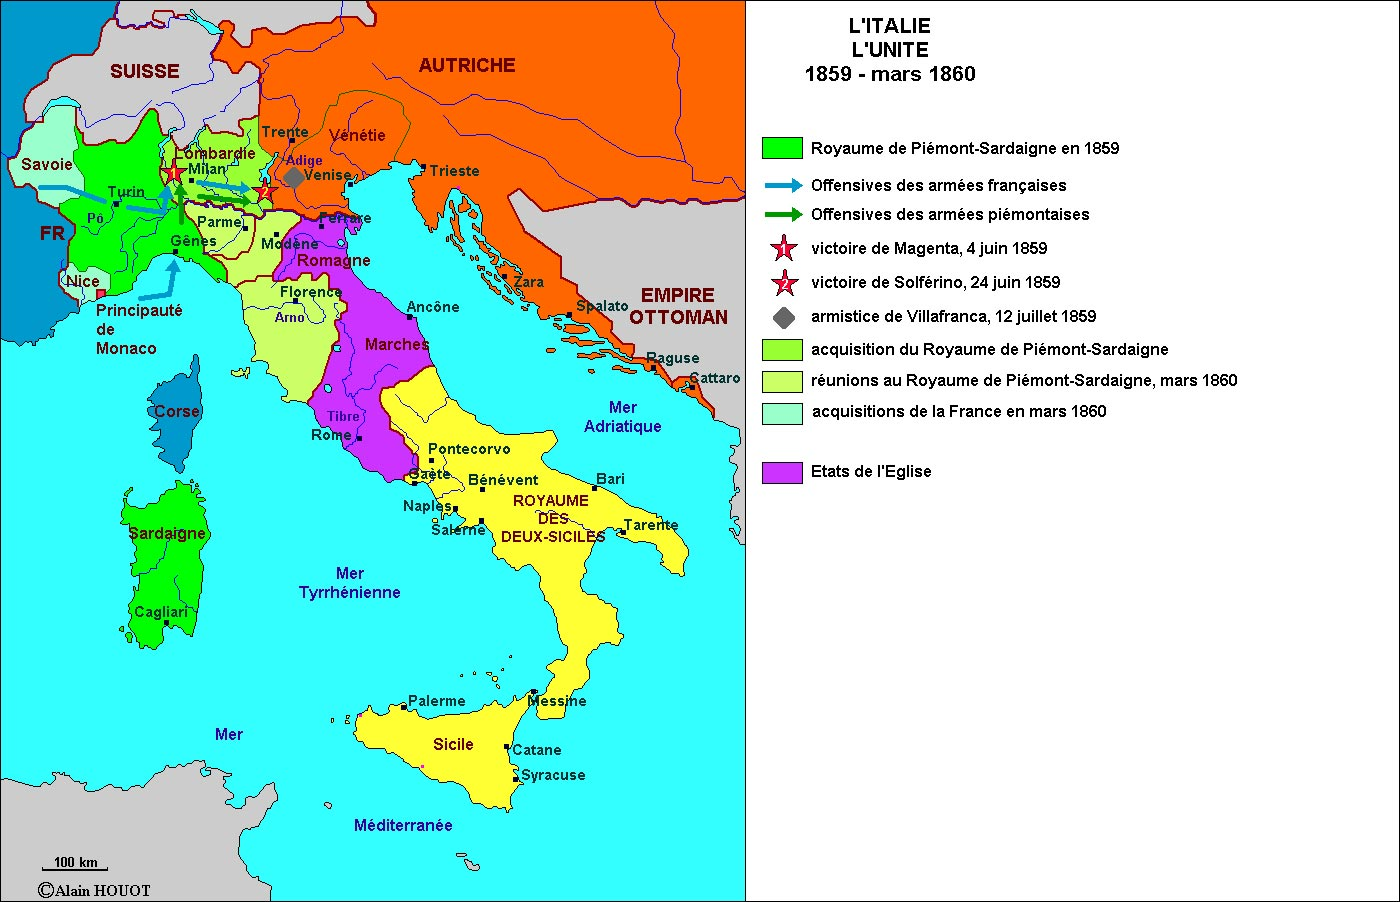 Carte Italie Xve Siecle.Italie Pays Vacances Arts Guides Voyages